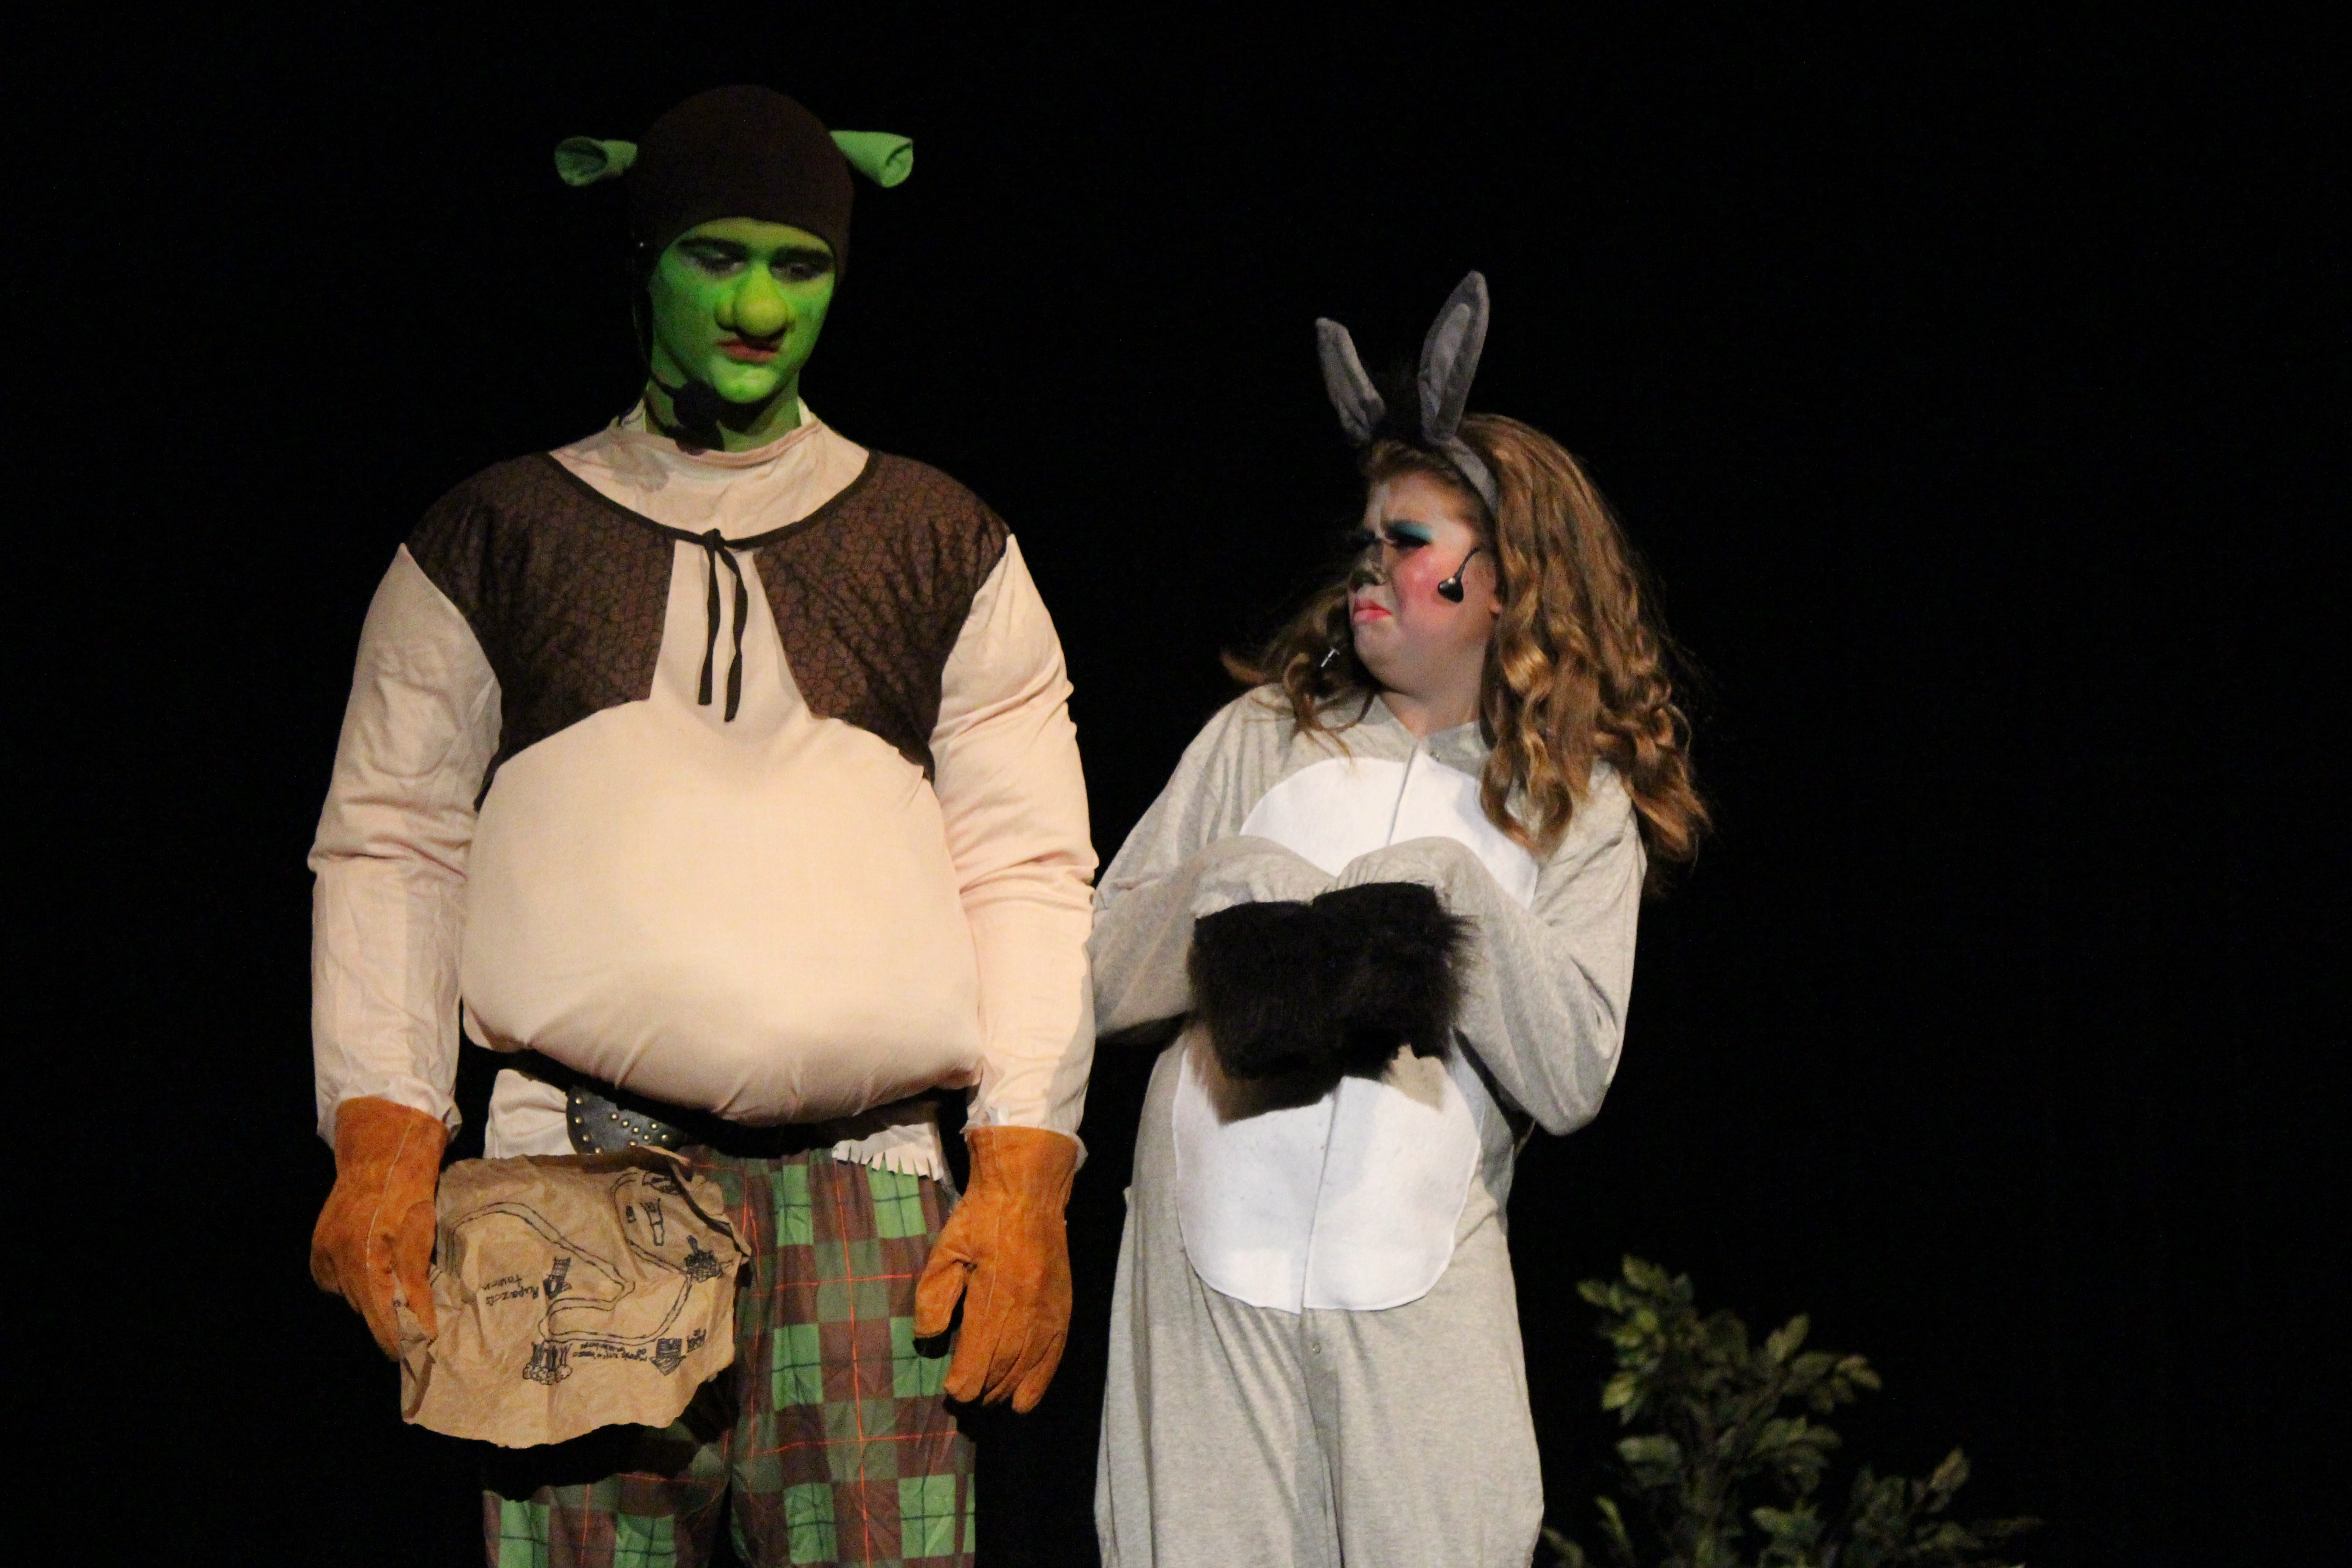 Shrek at RockShow Academy